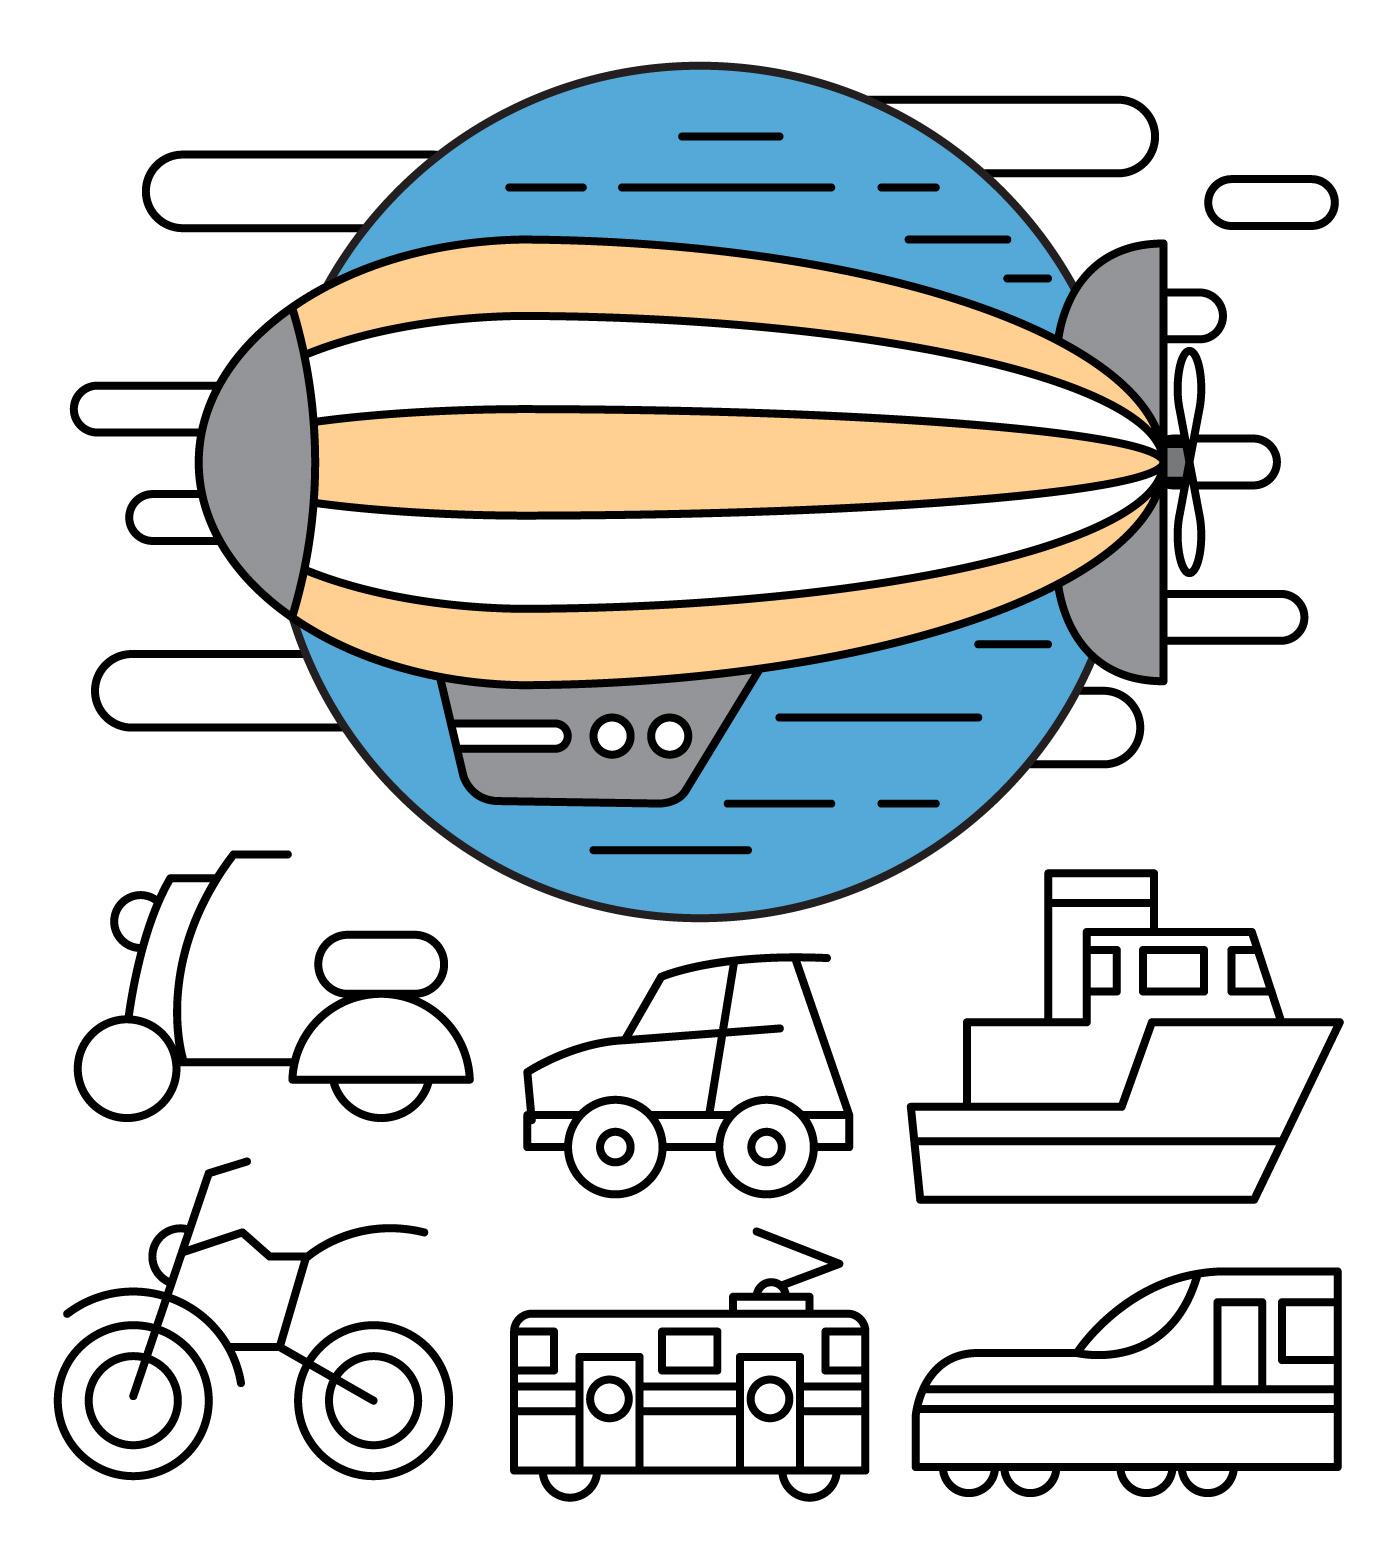 Minimal transportation icons download free vector art for Minimal art vector